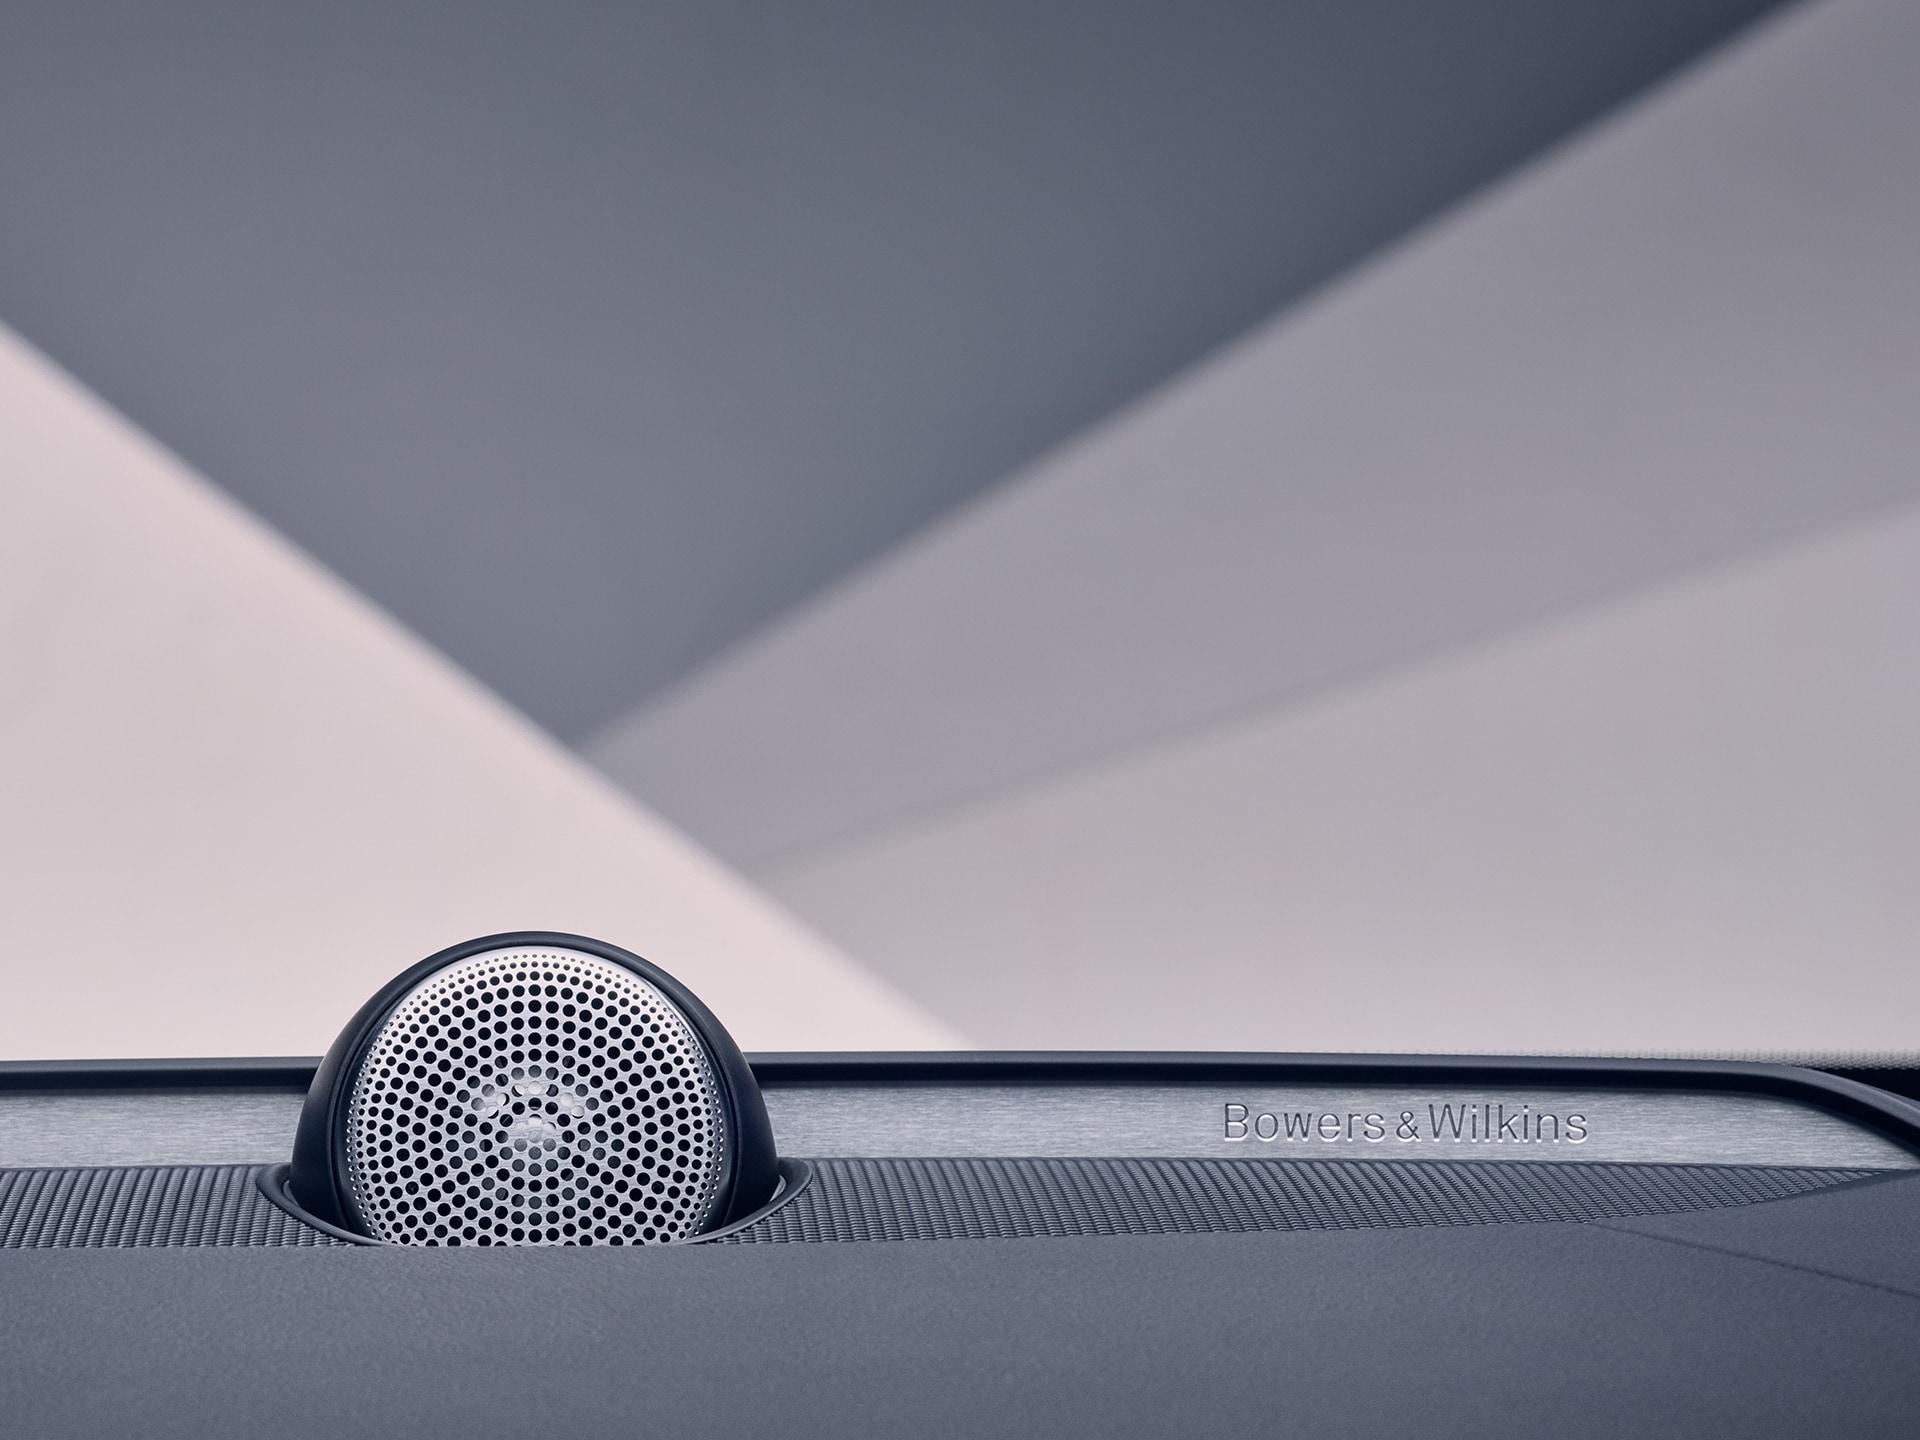 Bowers & Wilkins speakers inside a Volvo